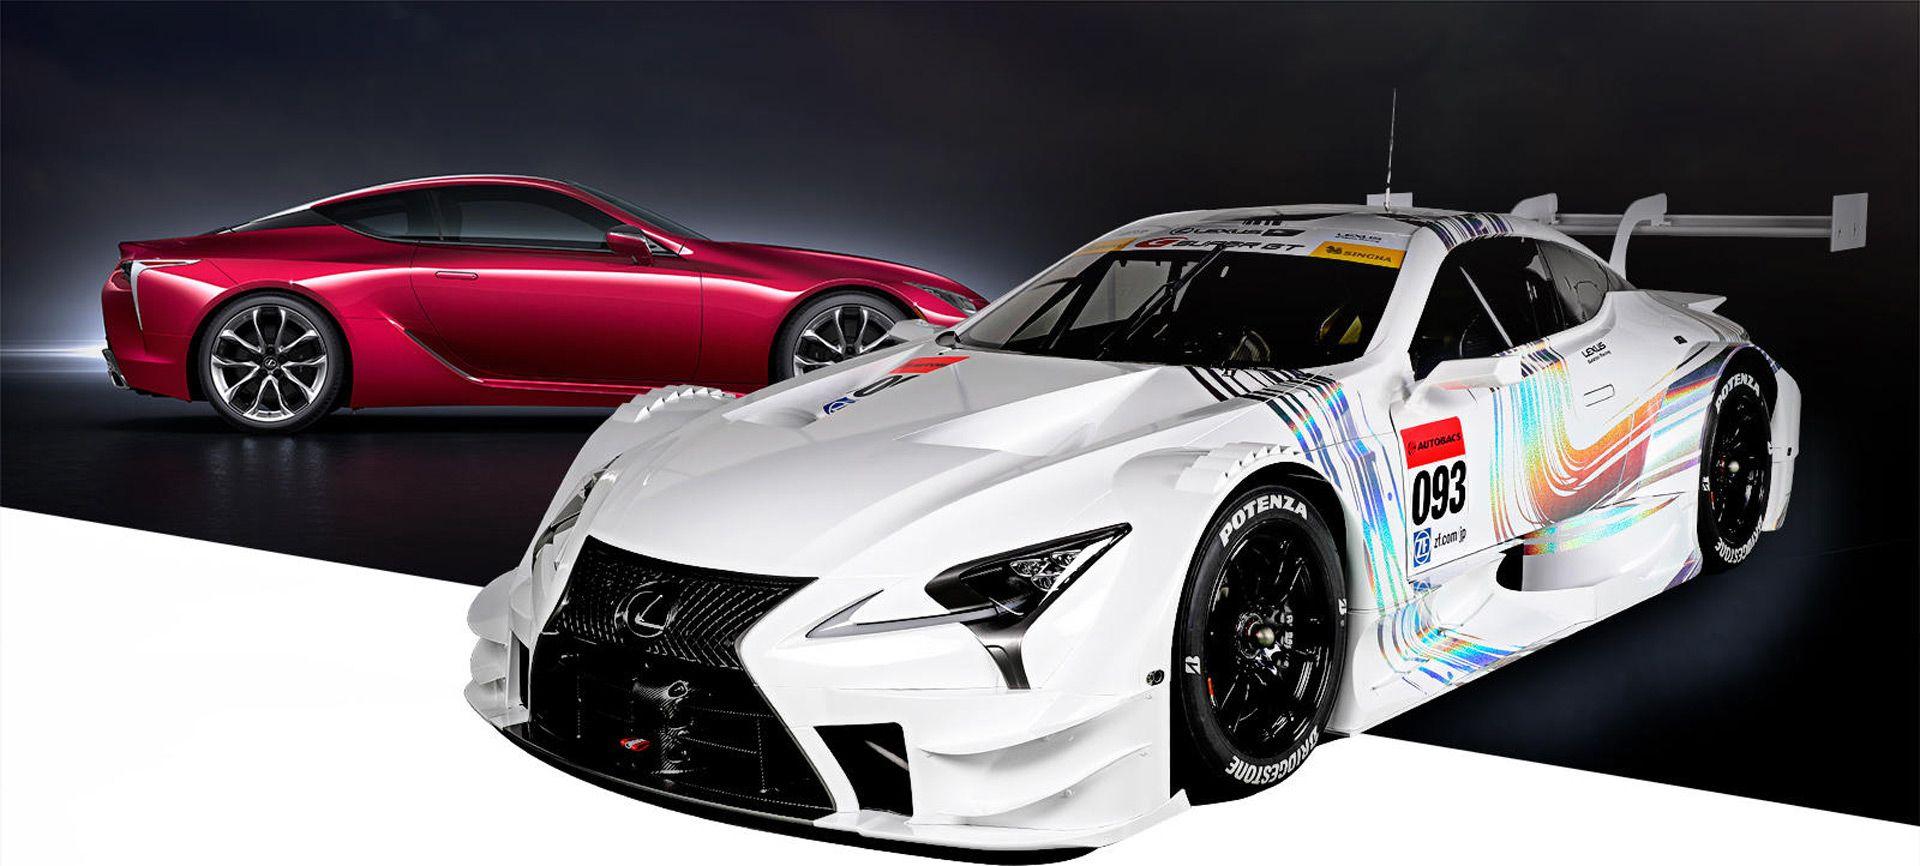 2017 lexus lc super gt racer revealed